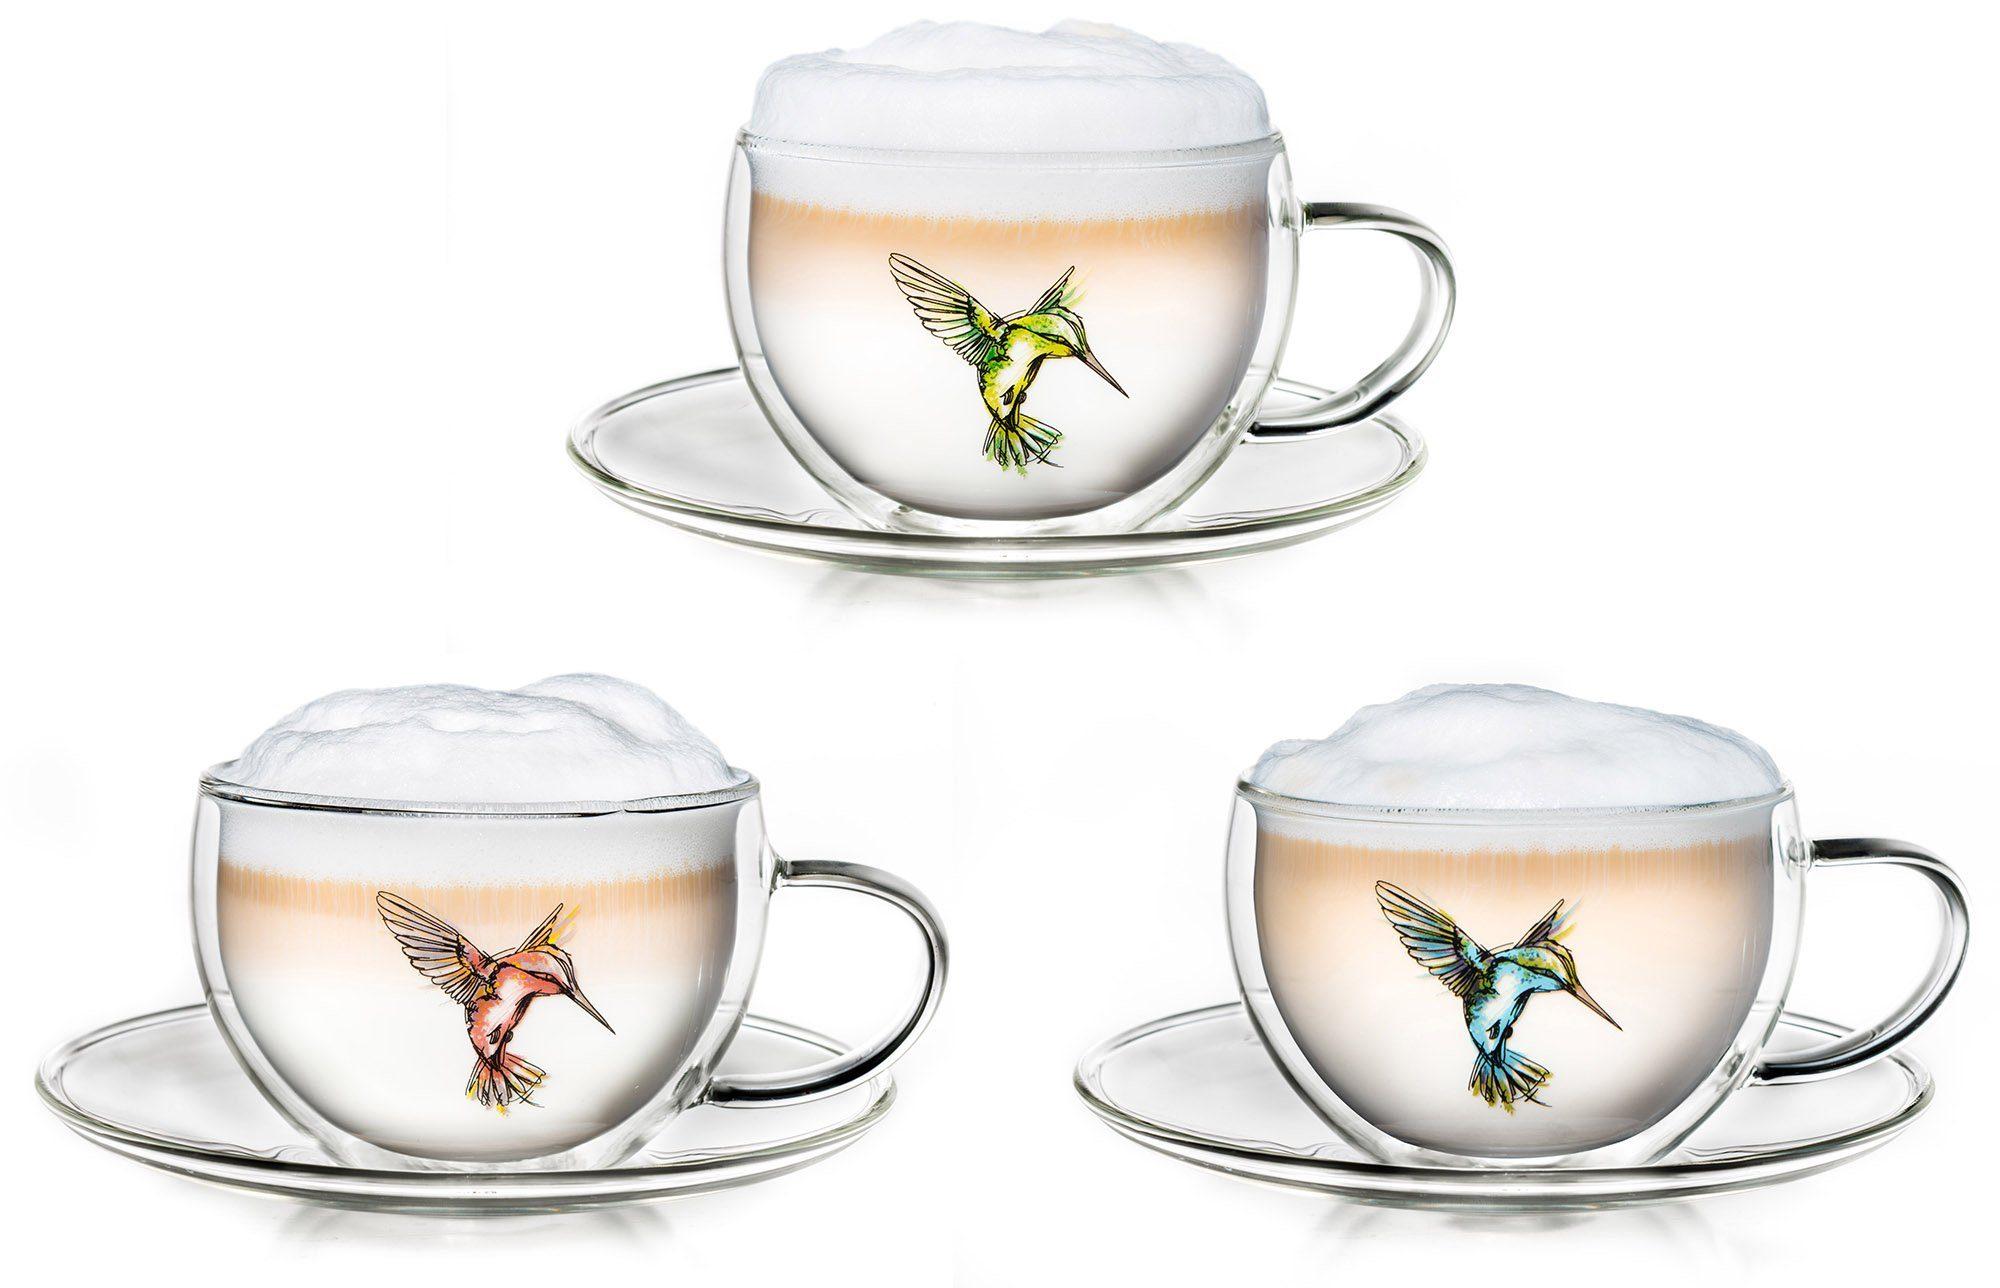 Creano Thermo-Tasse, 3-er Set, doppelwandige Tee-Tasse, Latte Macchiato Tasse, »Hummi«